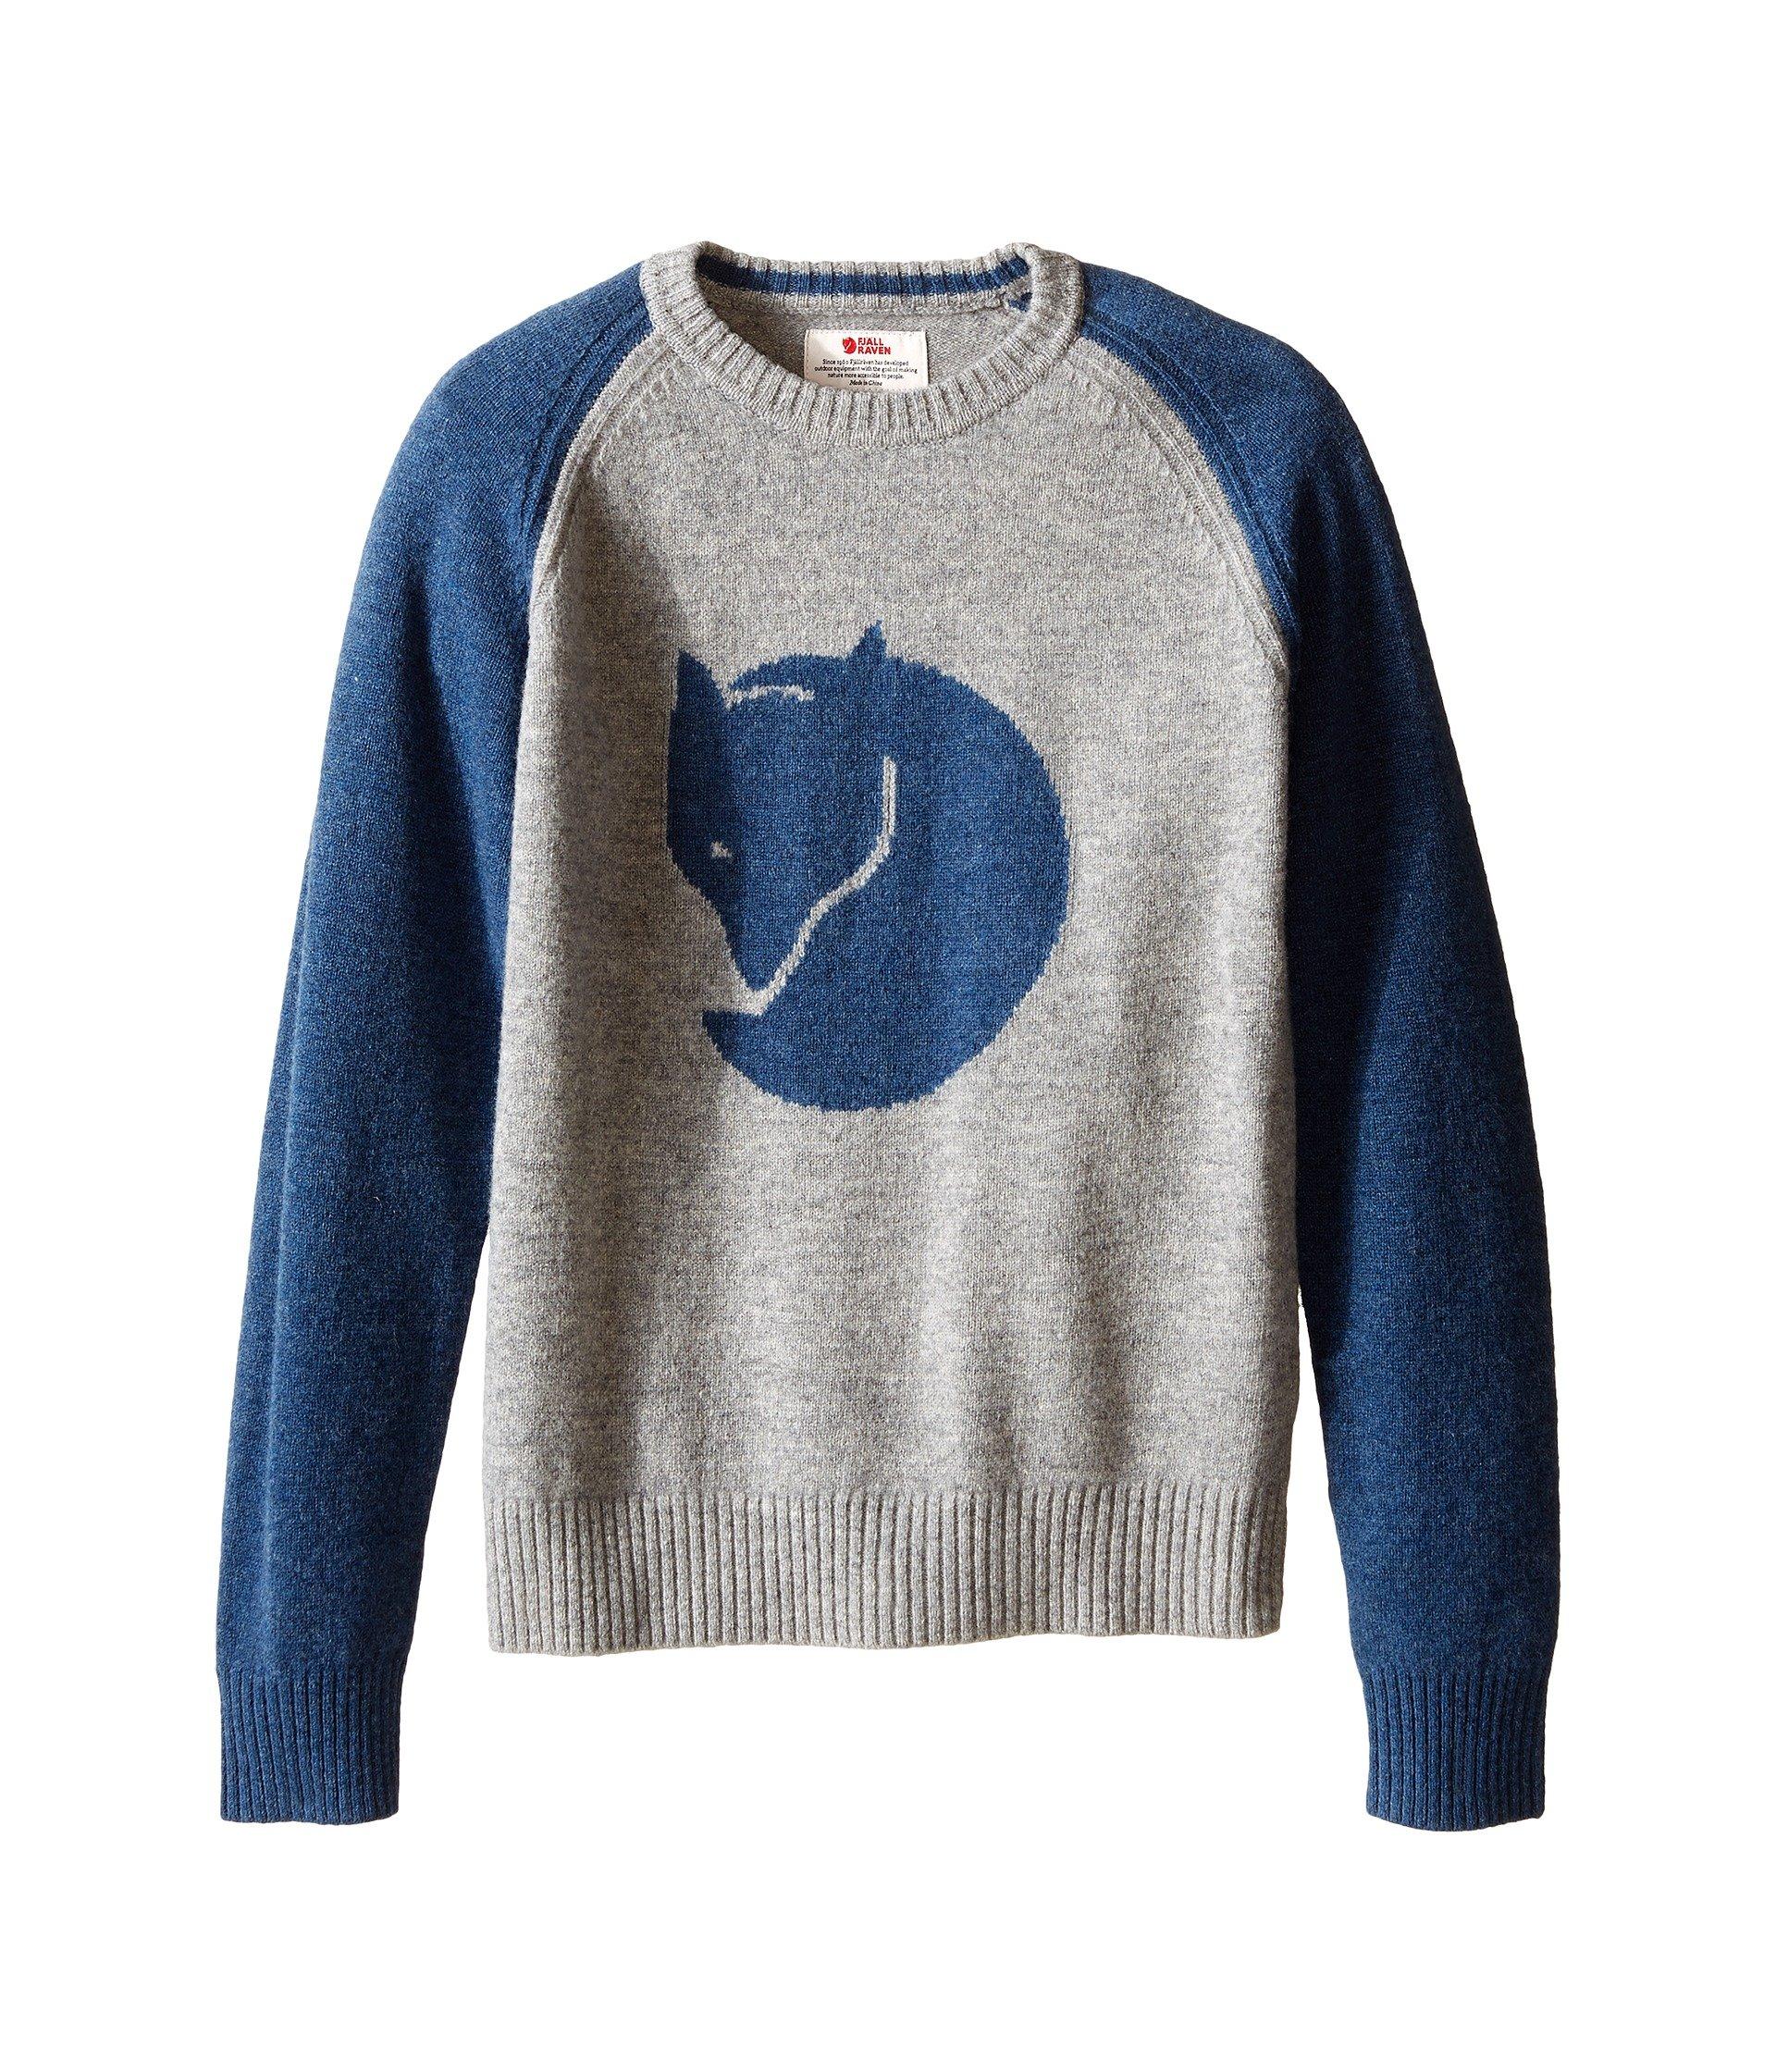 Fjallraven Kids Unisex Kids Fox Sweater Uncle Blue Sweater 116 (5-6 Years Old)